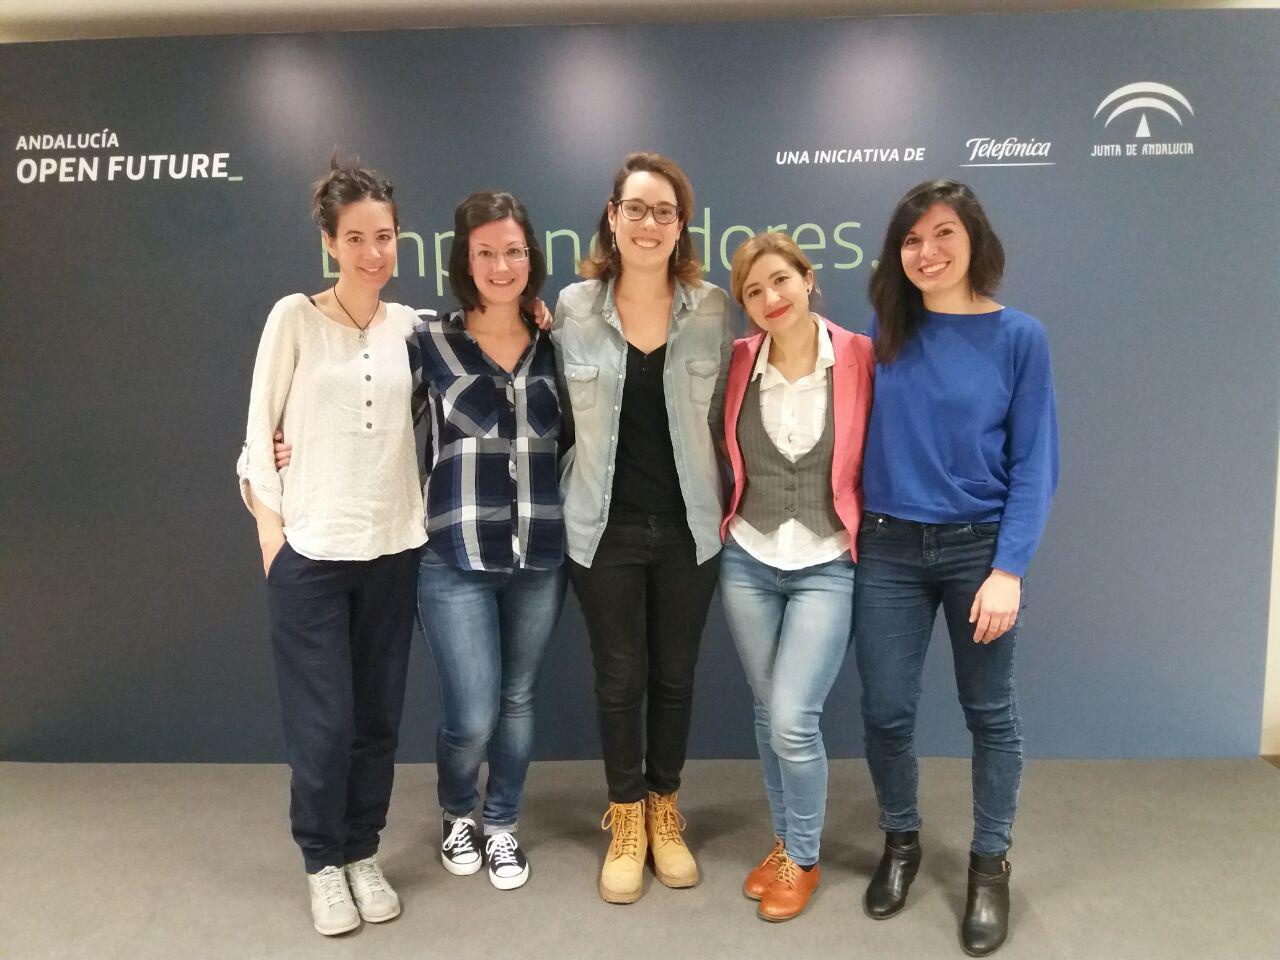 equipo-iMaPas-andalucia-open-future-1